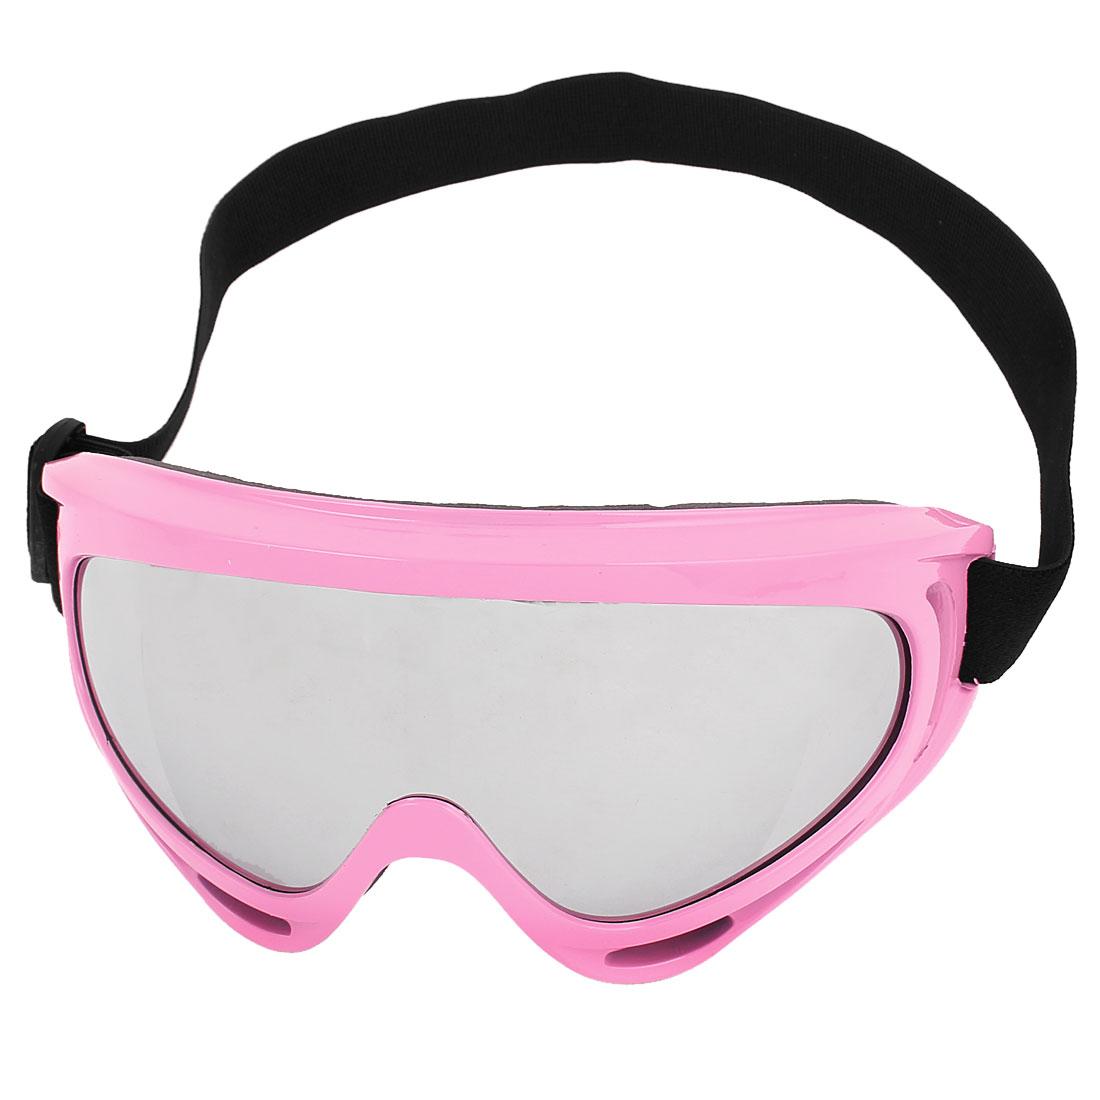 Elastic Headband Ski Horse Riding BMX Desert Motocross Motorcycle Goggles Pink